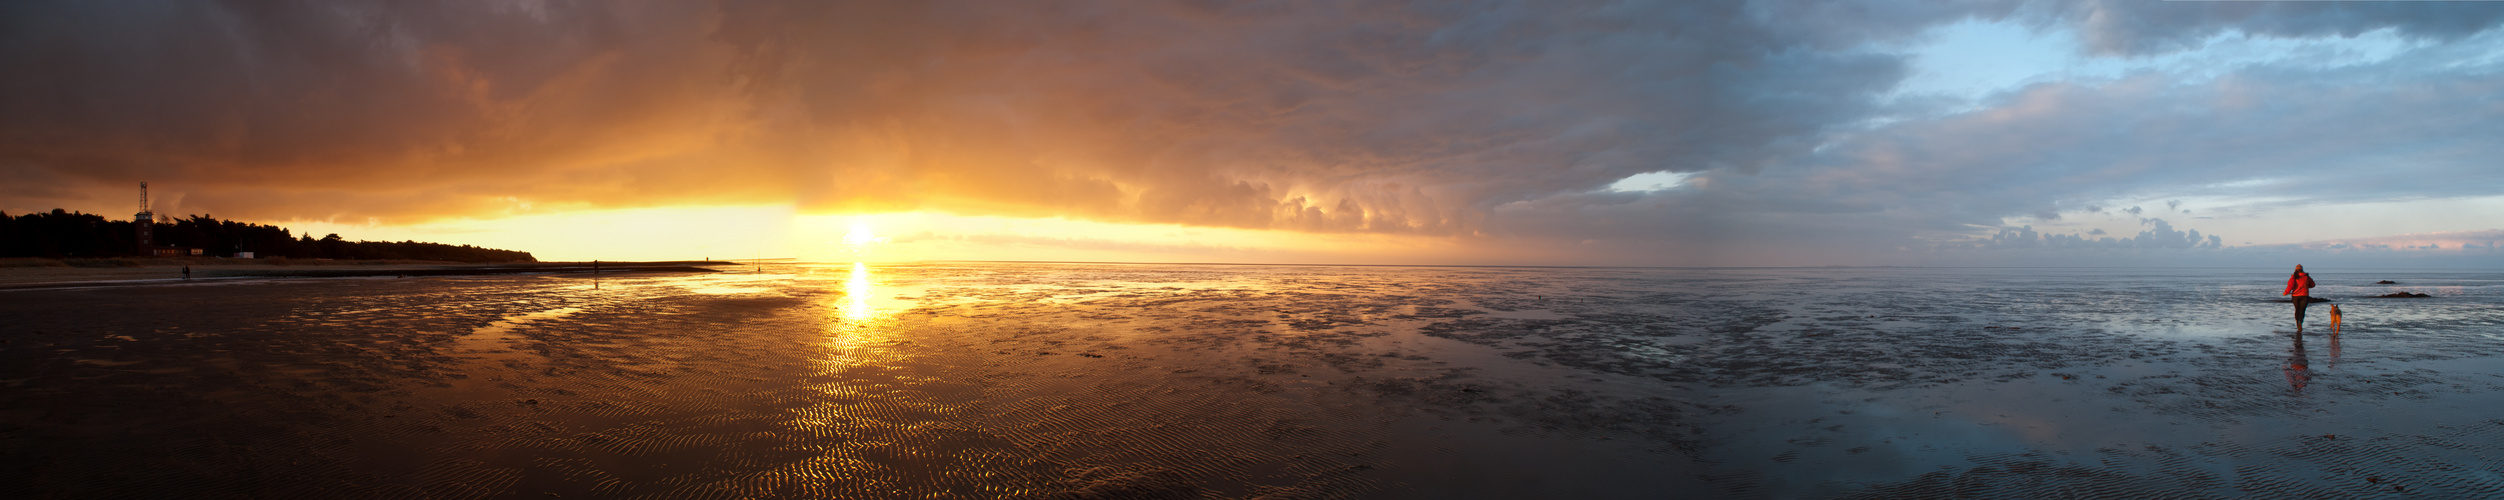 Cuxhavener Sonnenuntergang